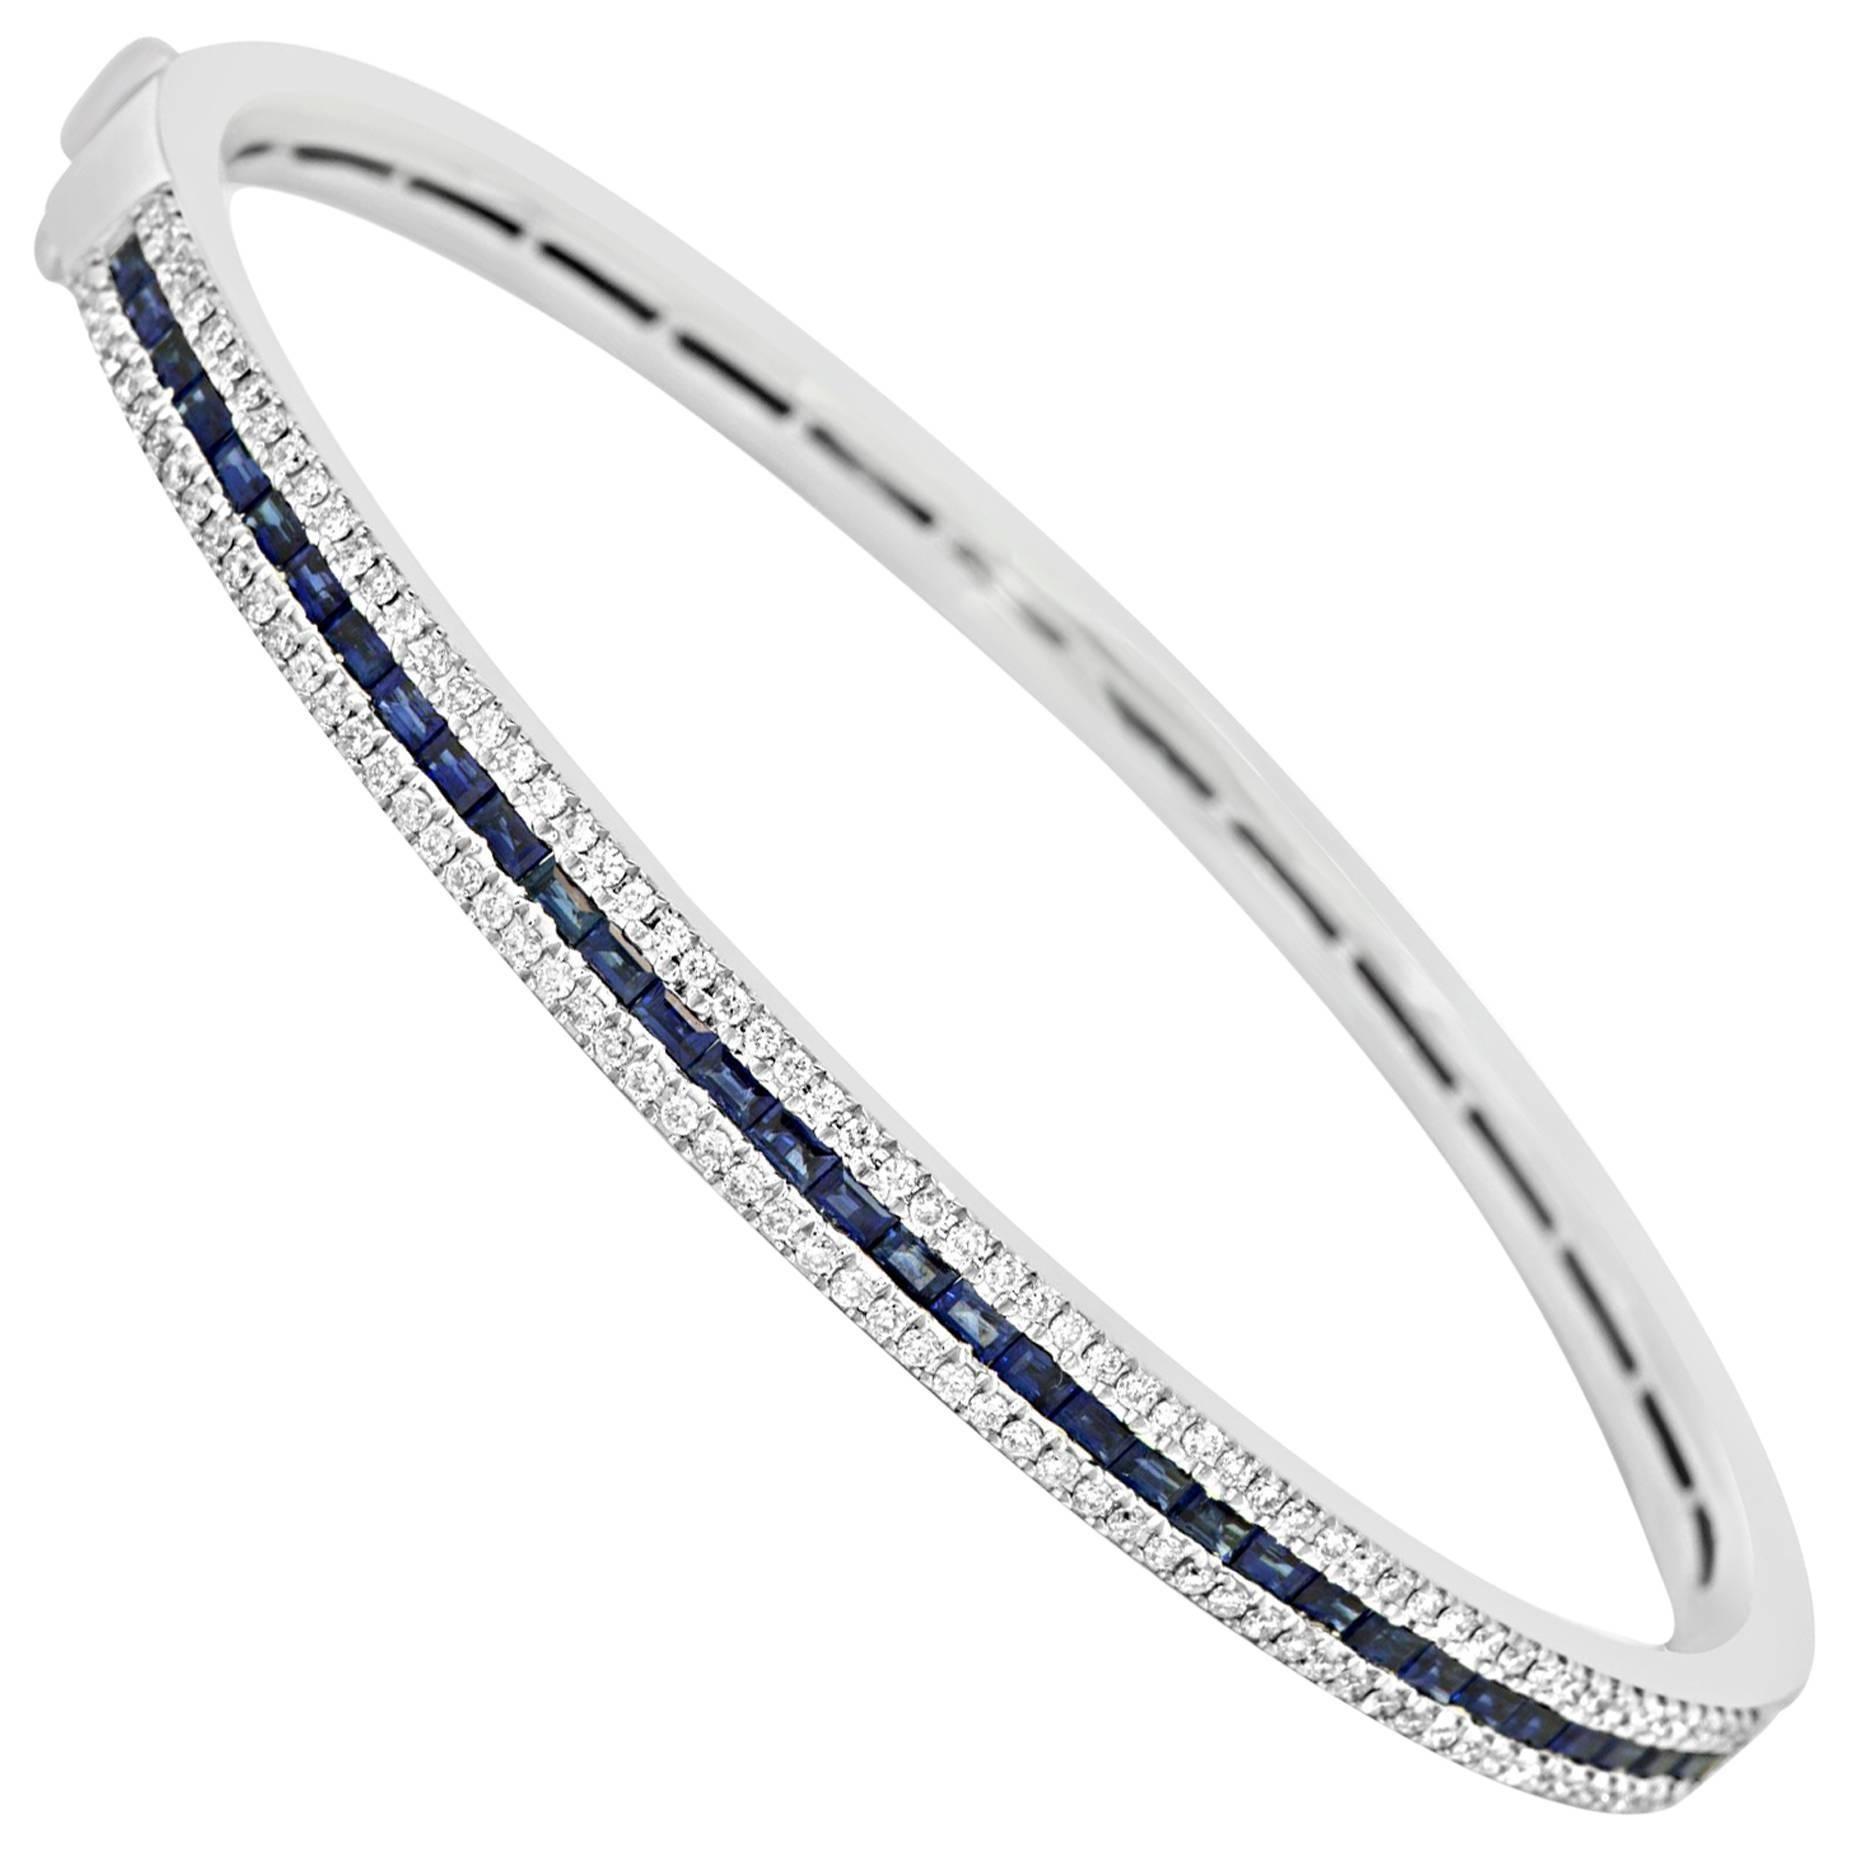 Blue Sapphire Diamond Gold Bangle Bracelet For Sale At 1stdibs